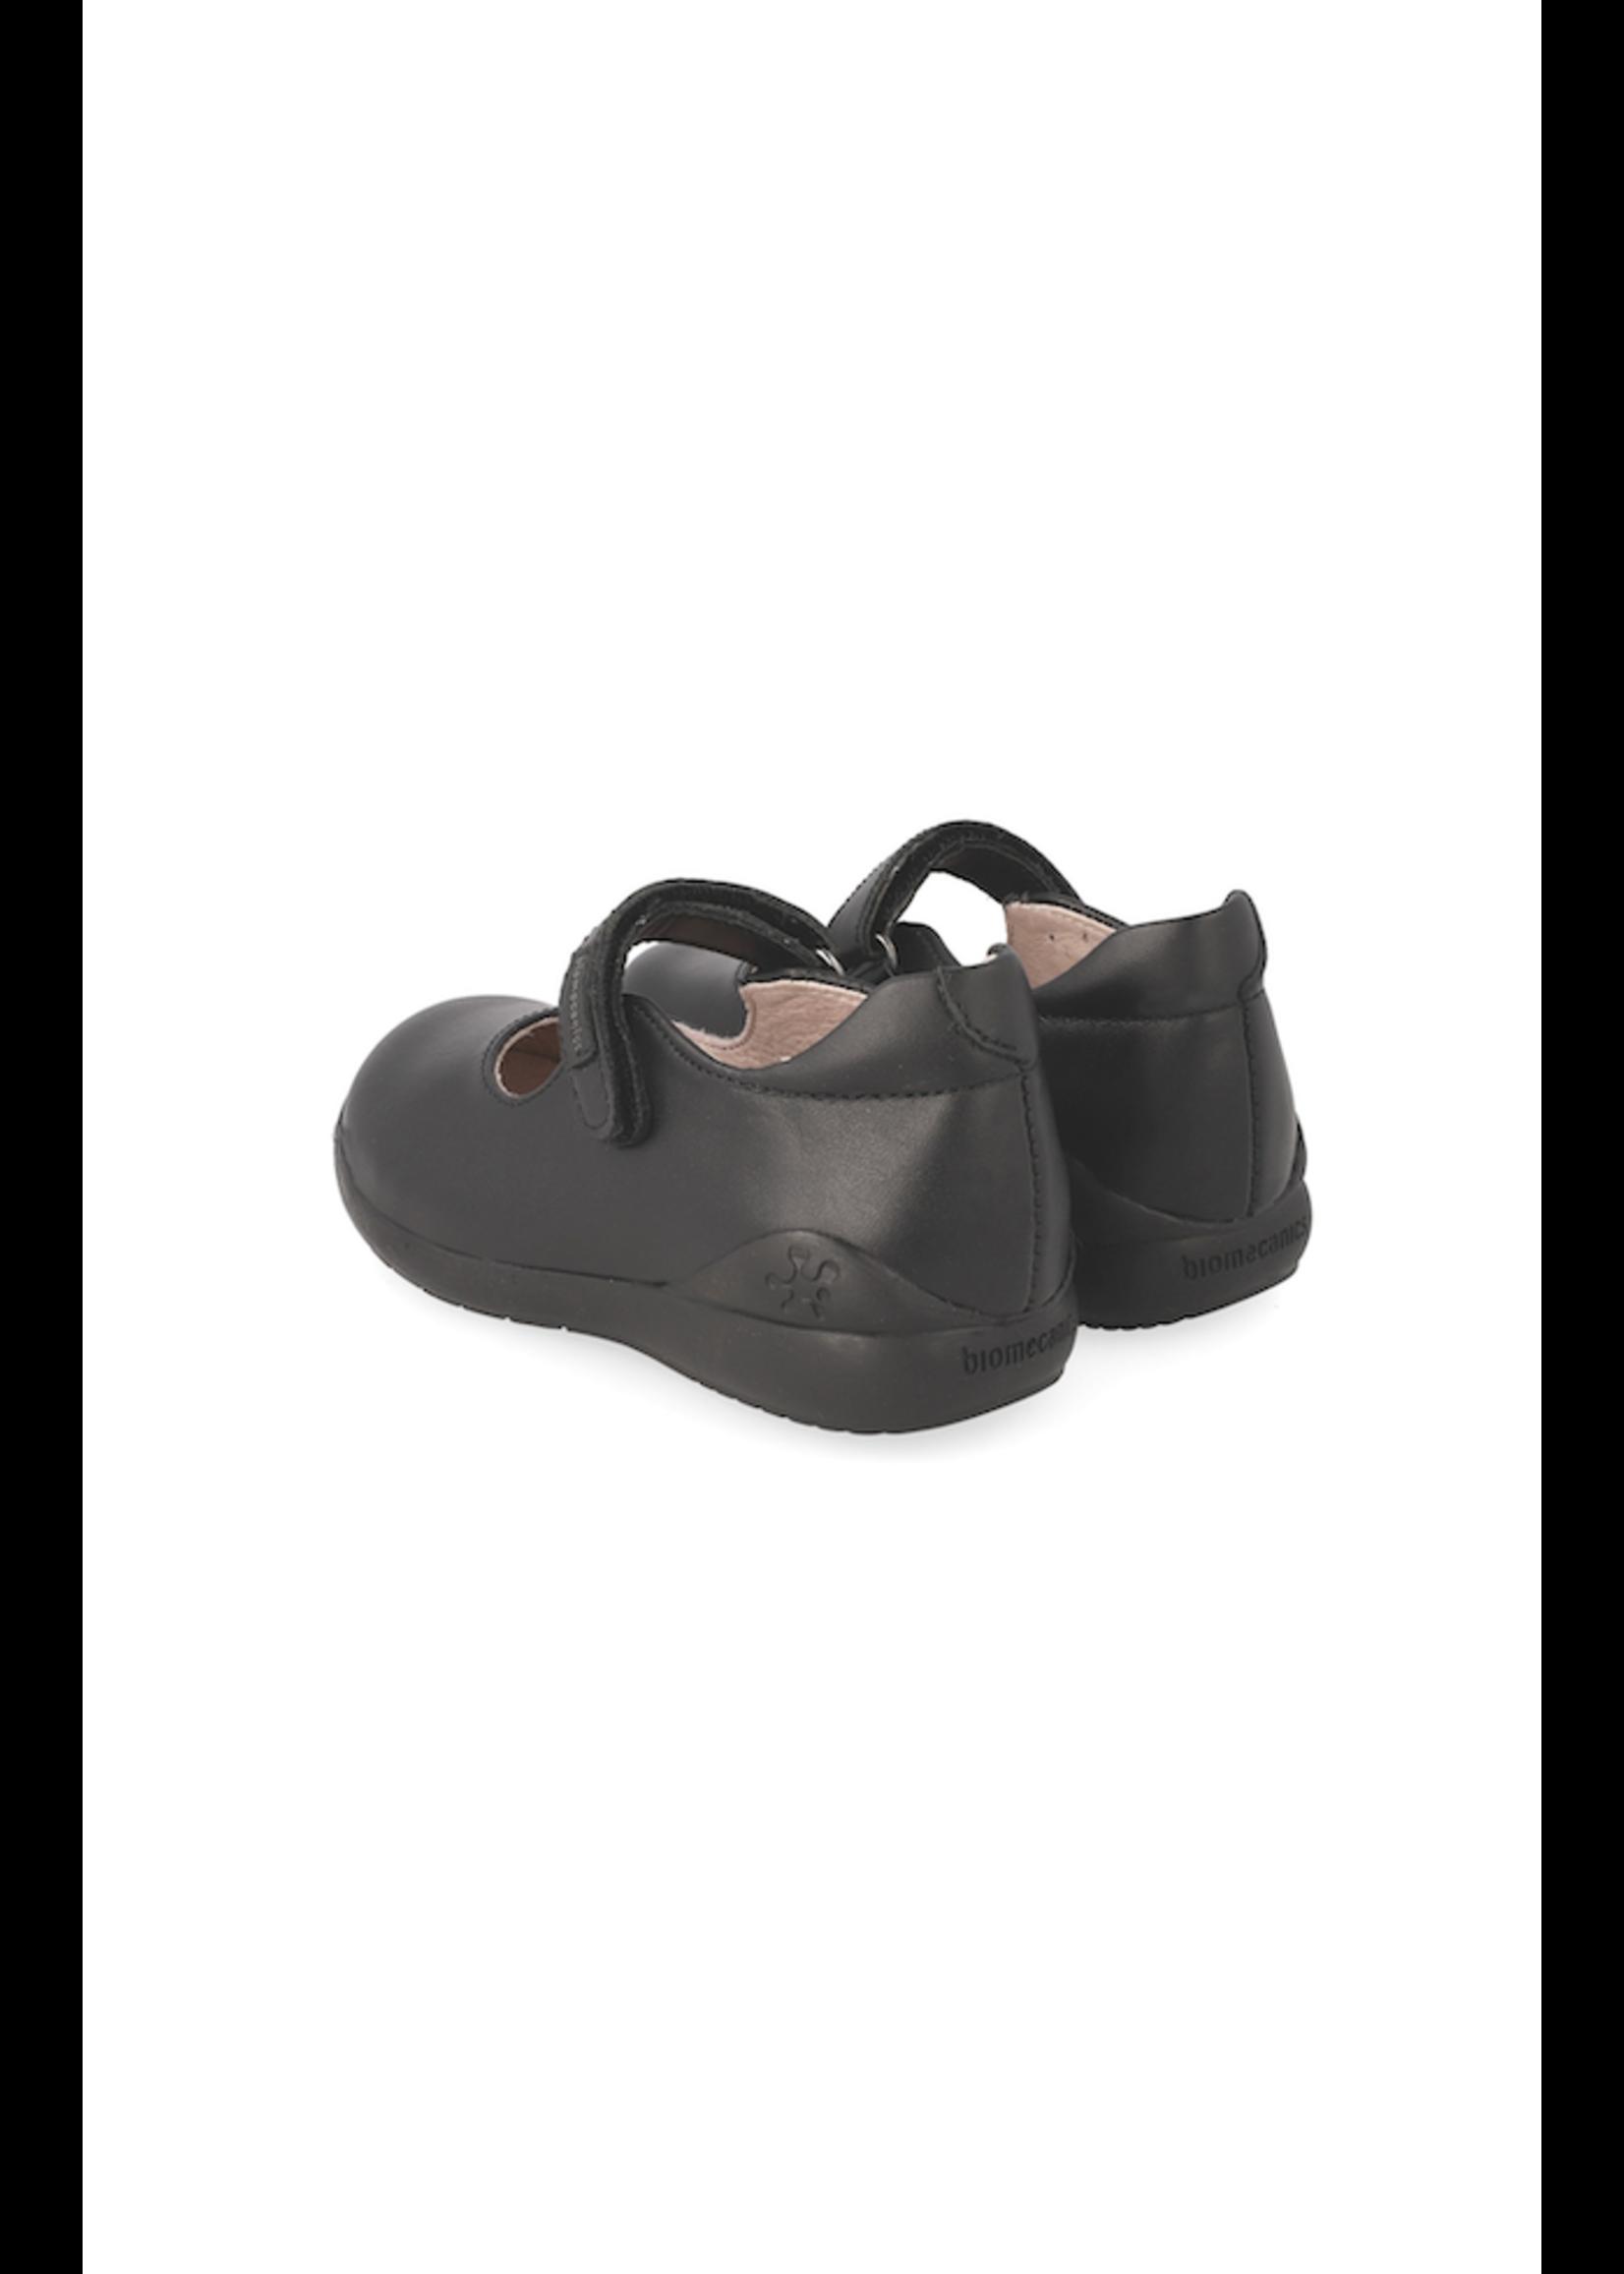 Biomechanics Biomechanics, Black Napa Velcro Mary Jane Uniform Shoes